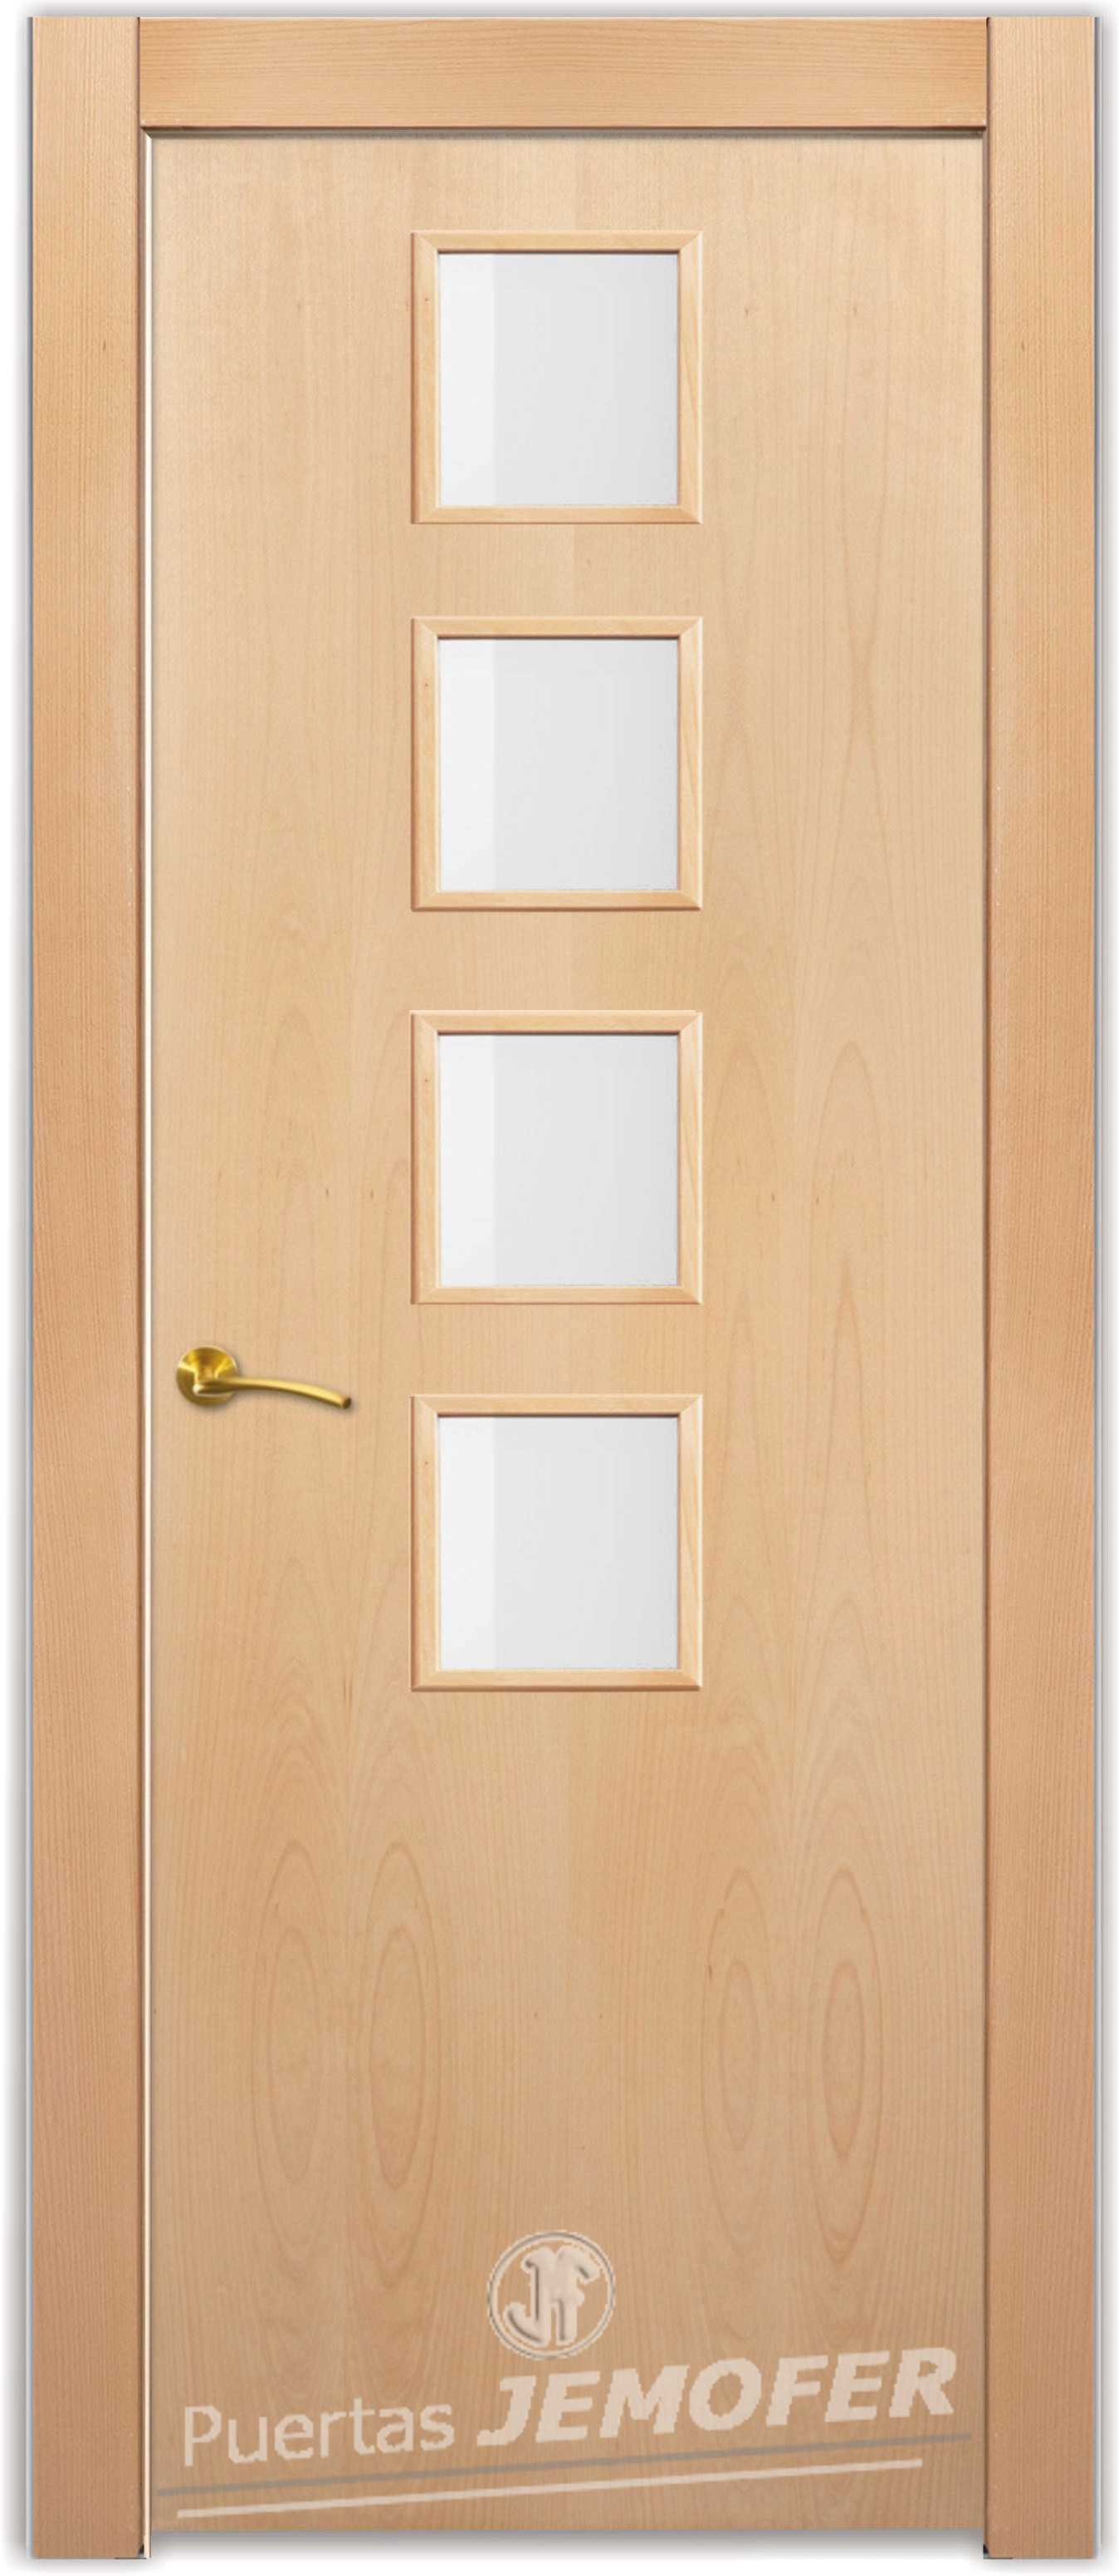 Puerta interior moderna l1 4vc puertas jemofer for Puertas de interior modernas